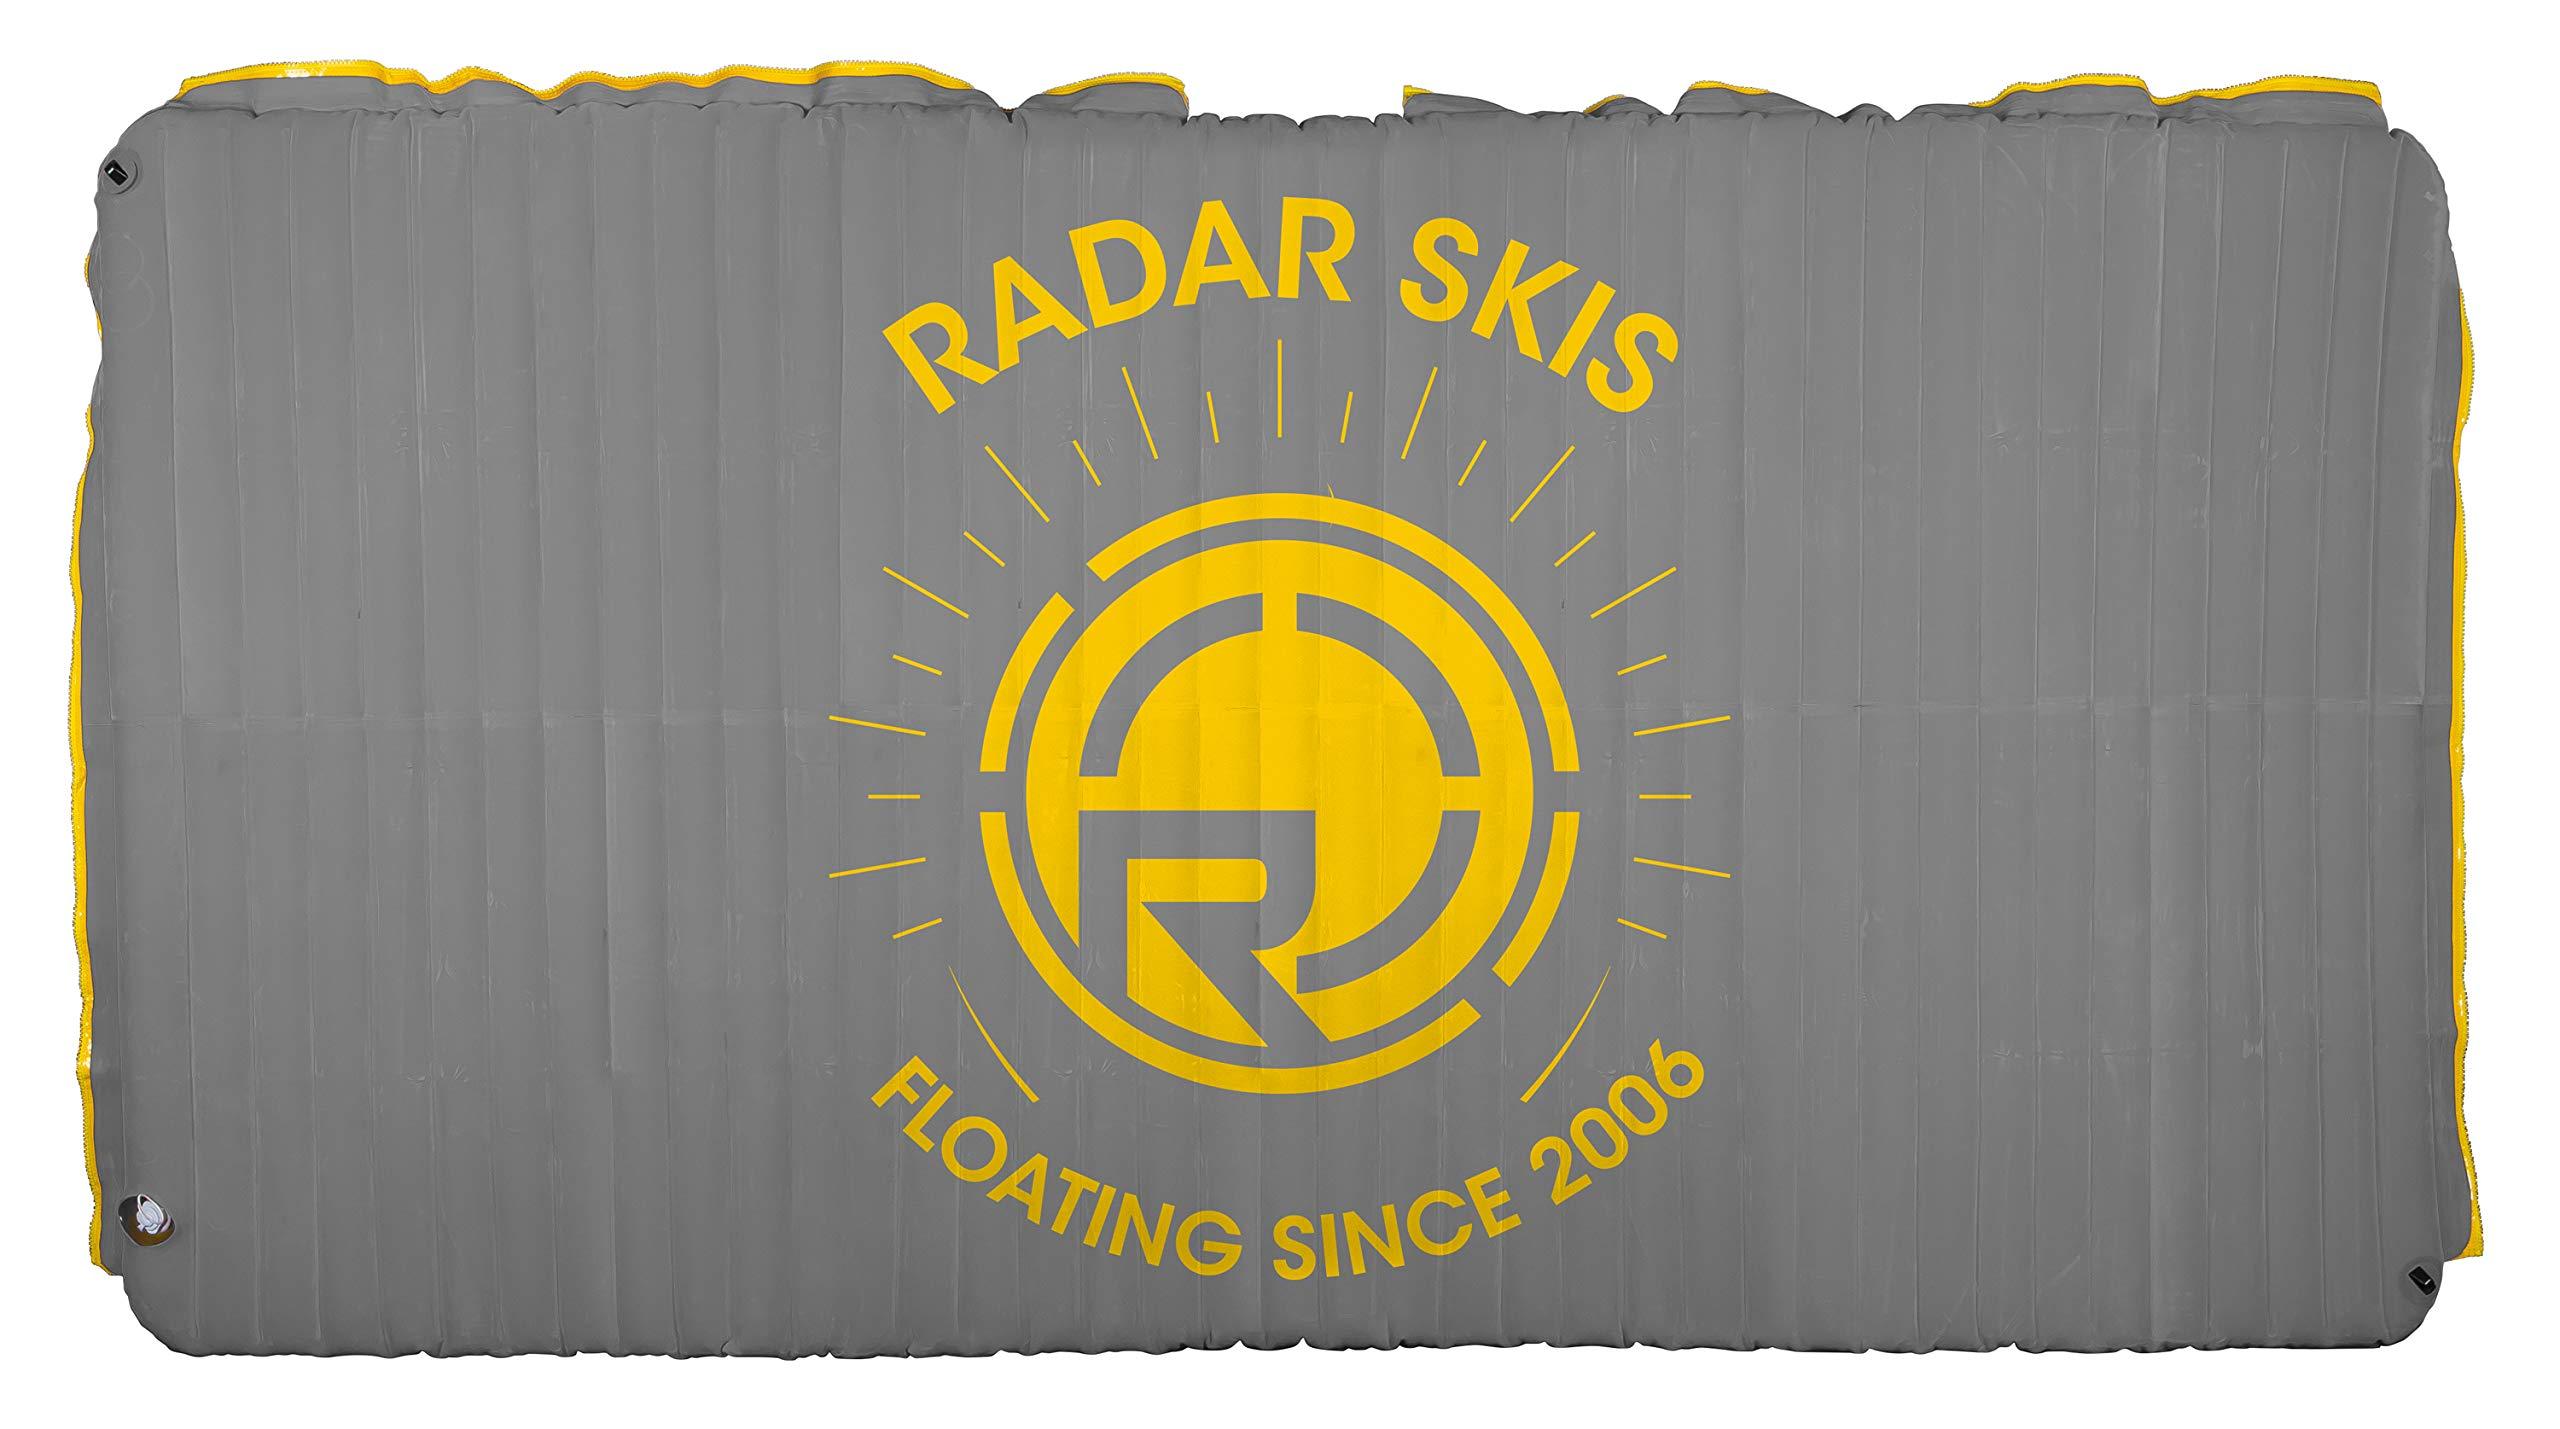 Radar Cloud Water Mat - Silver/Yellow - 5' x 10' (2017) by Radar Skis